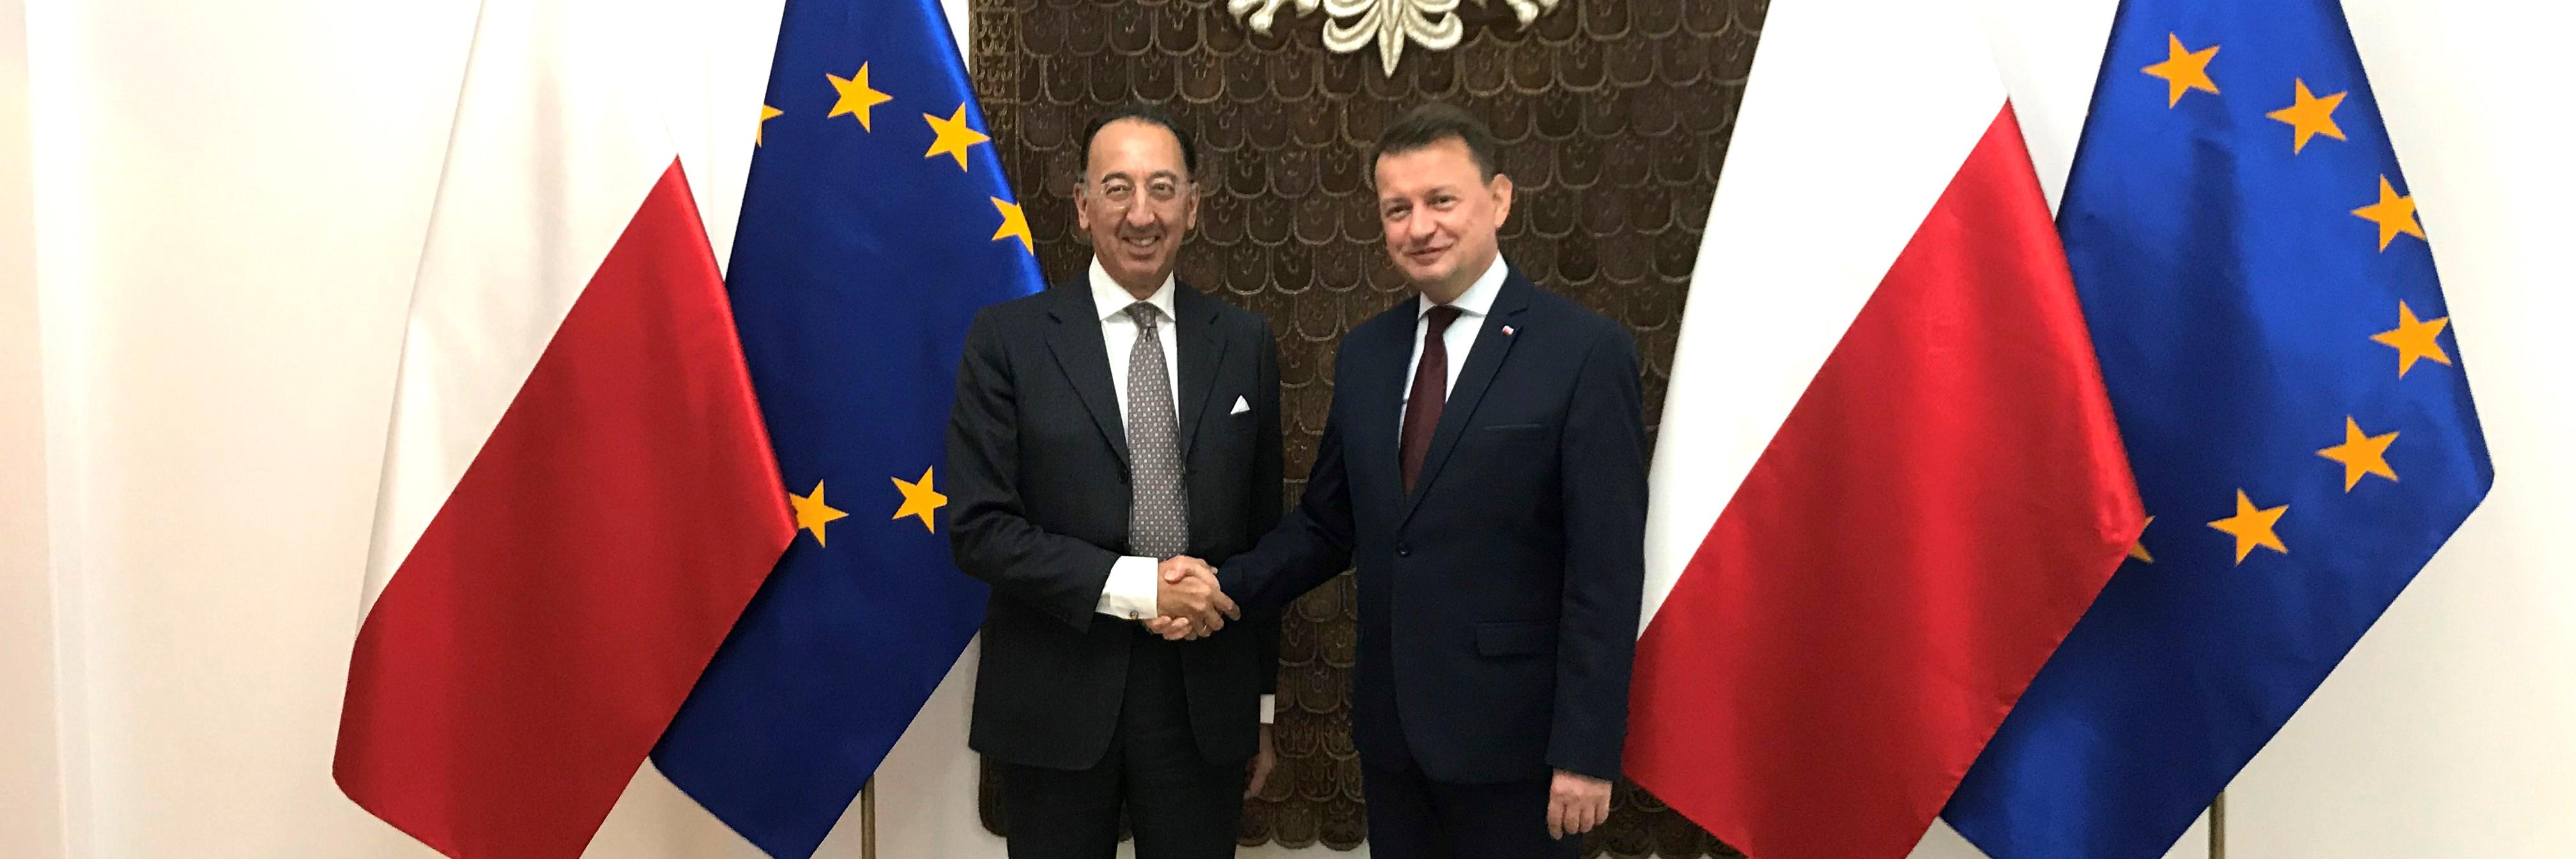 EDA Chief Executive holds talks in Poland